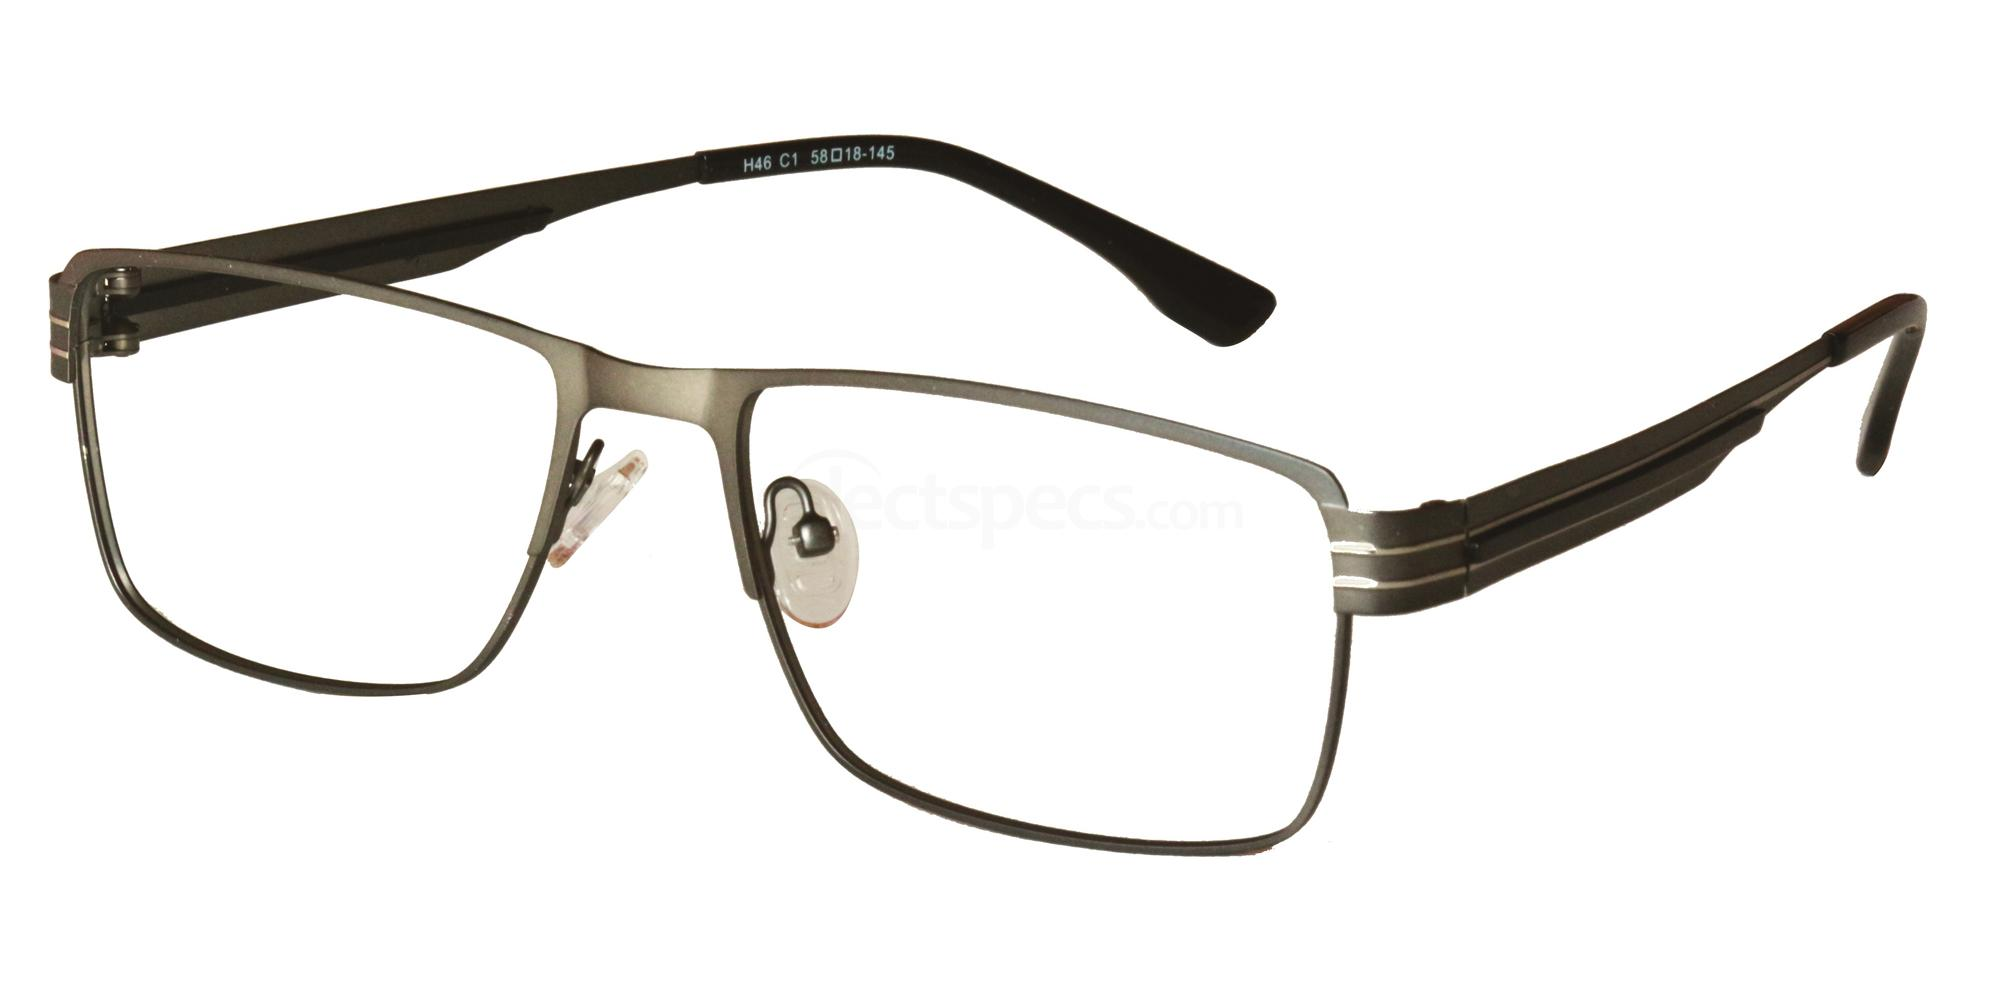 C1 H46 Glasses, Halstrom